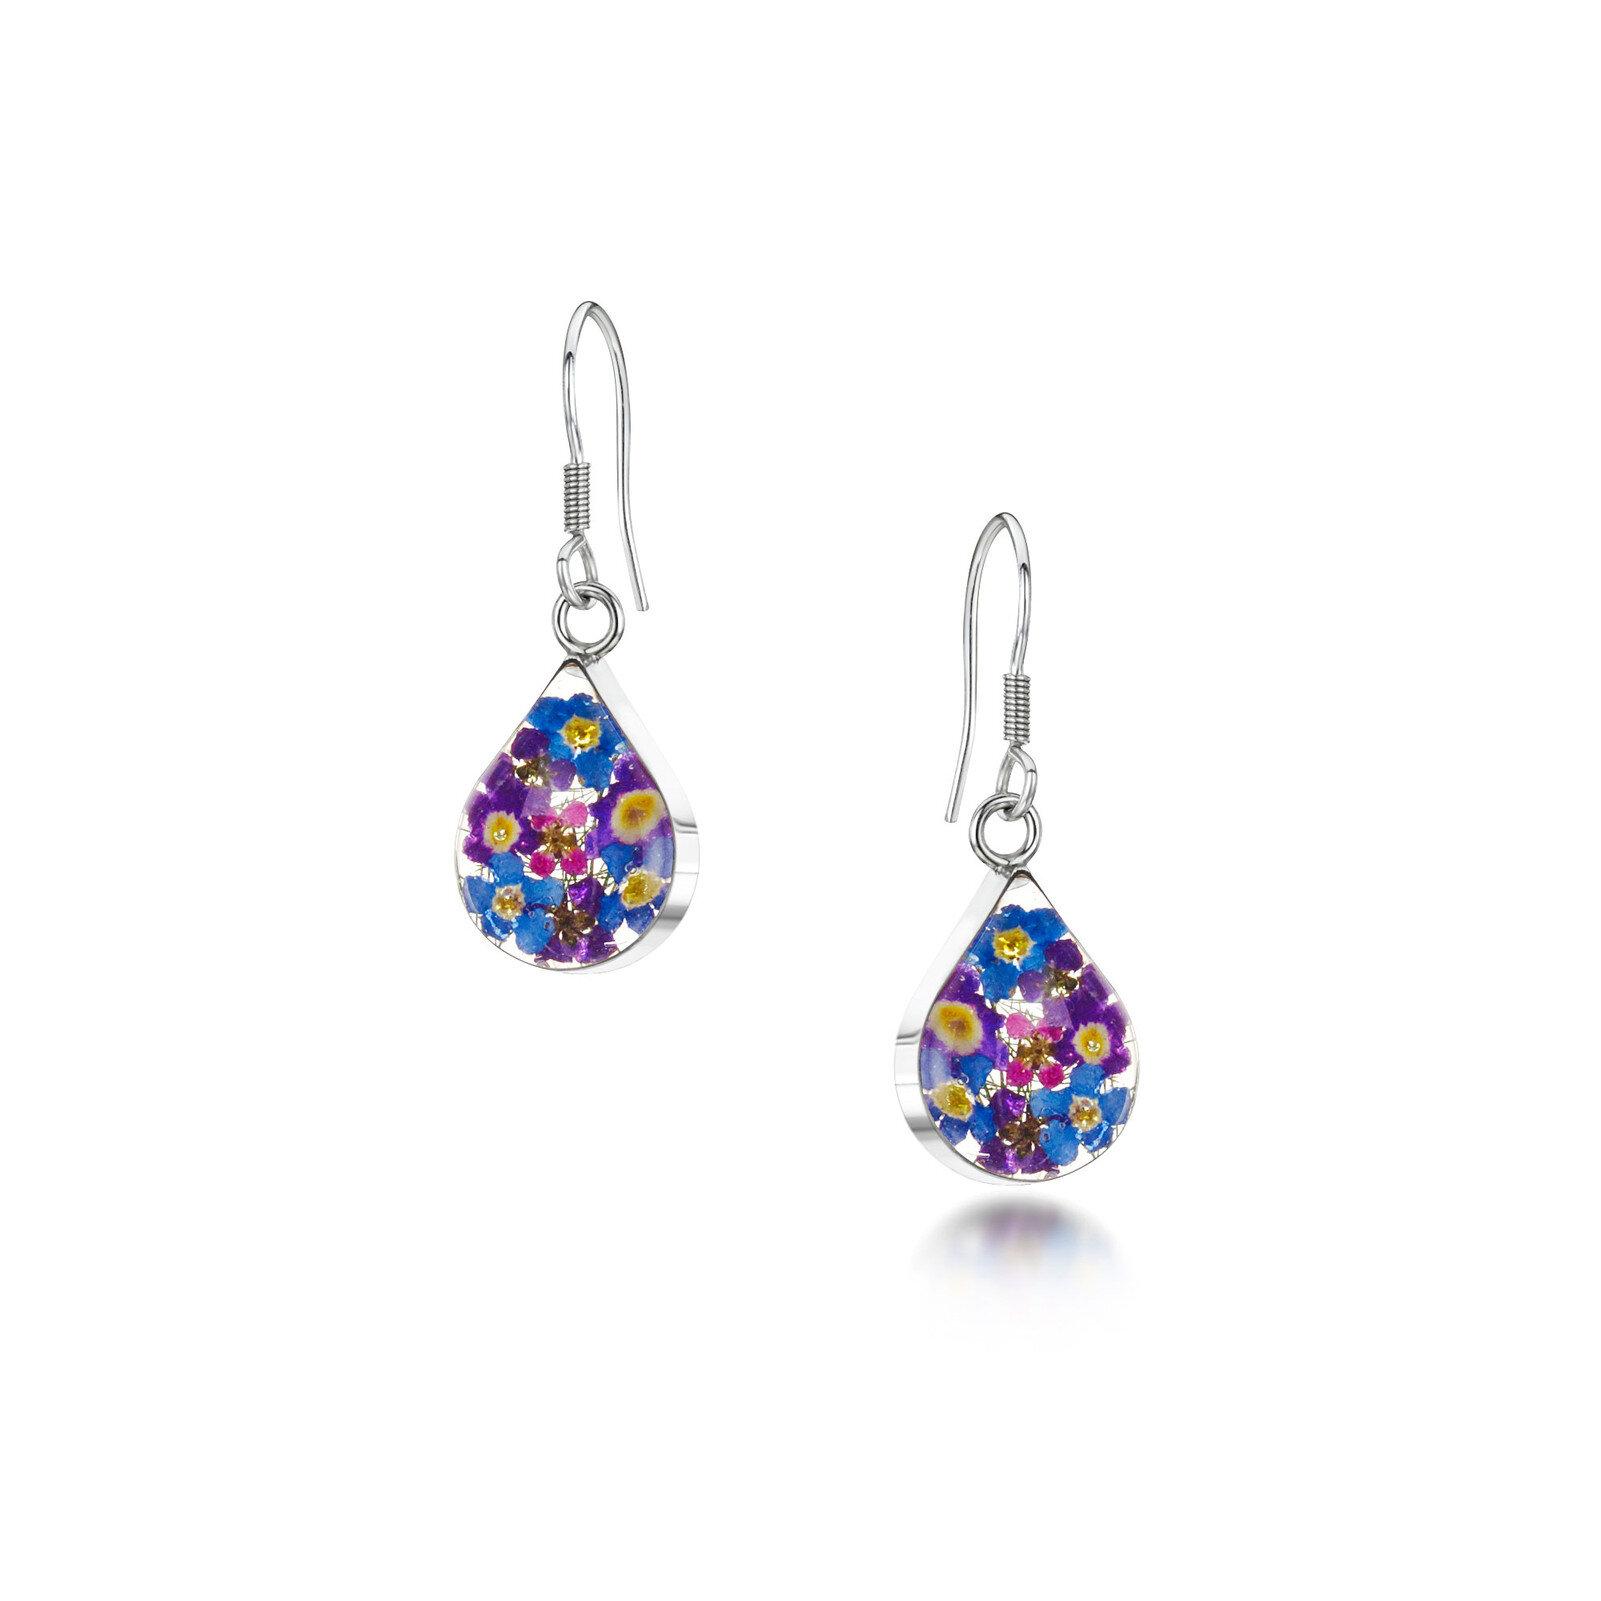 Sterling Silver Dangle Teardrop Earrings Gifts And Gallery